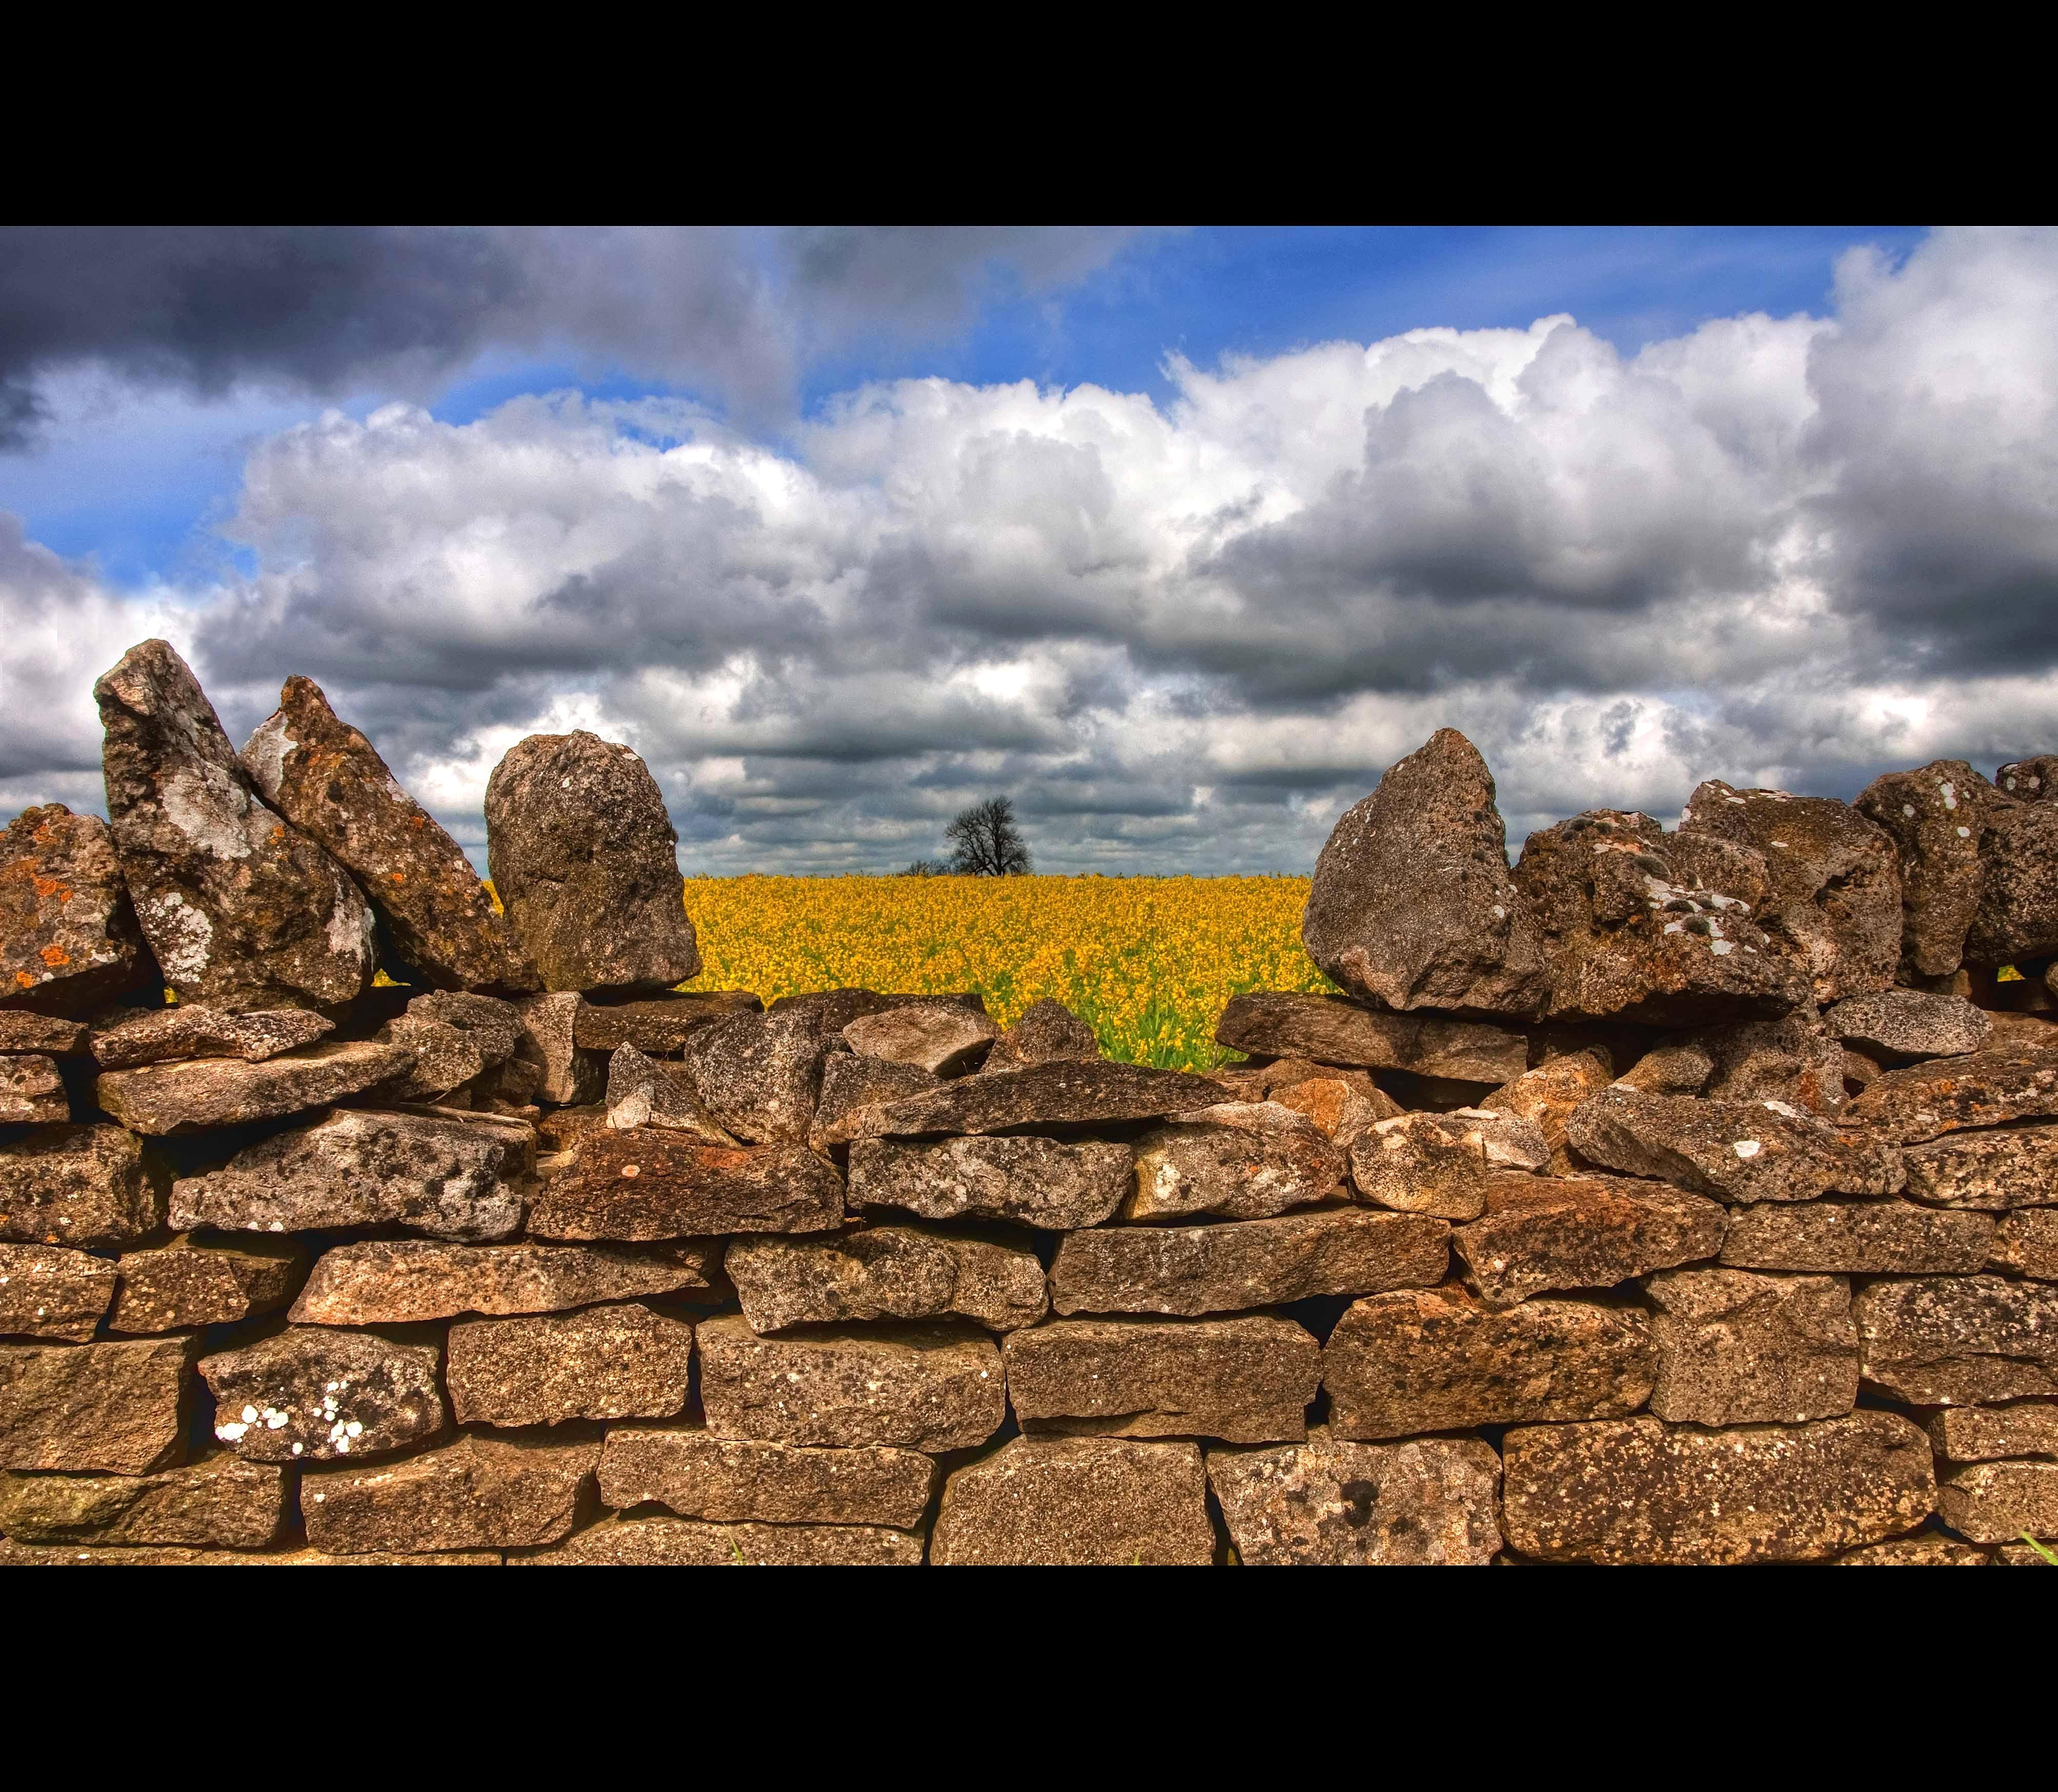 Wallpaper : landscape, rock, grass, sky, field, clouds